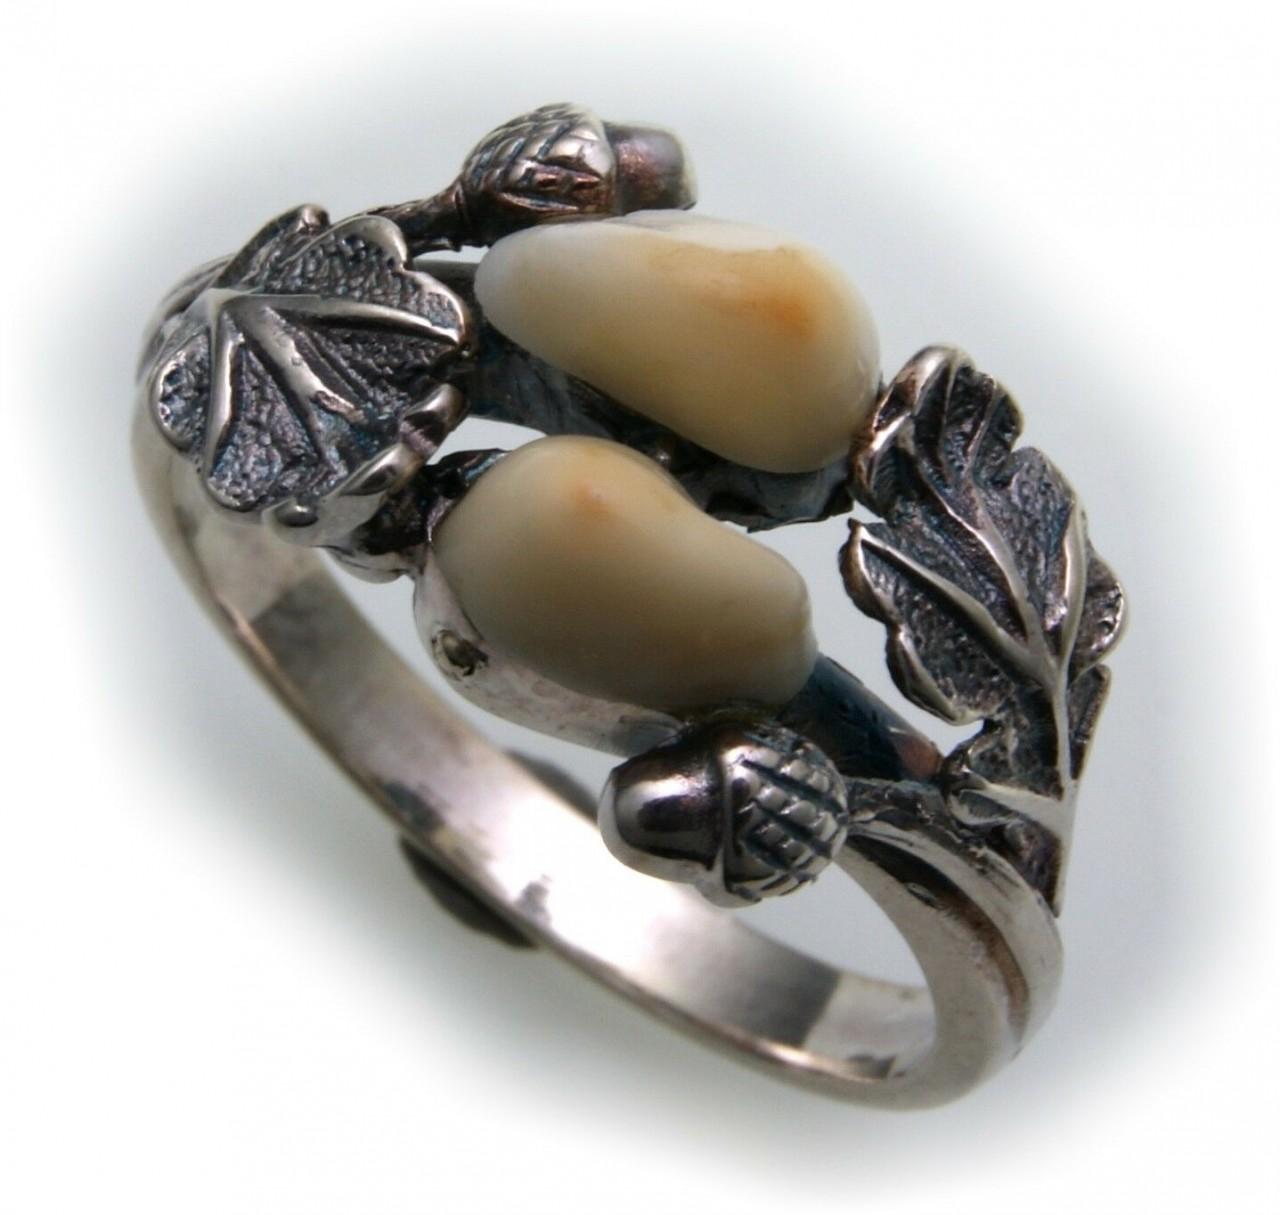 Grandel Ring echt Silber 925 Jagdschmuck Grandelschmuck Grandelring DR855